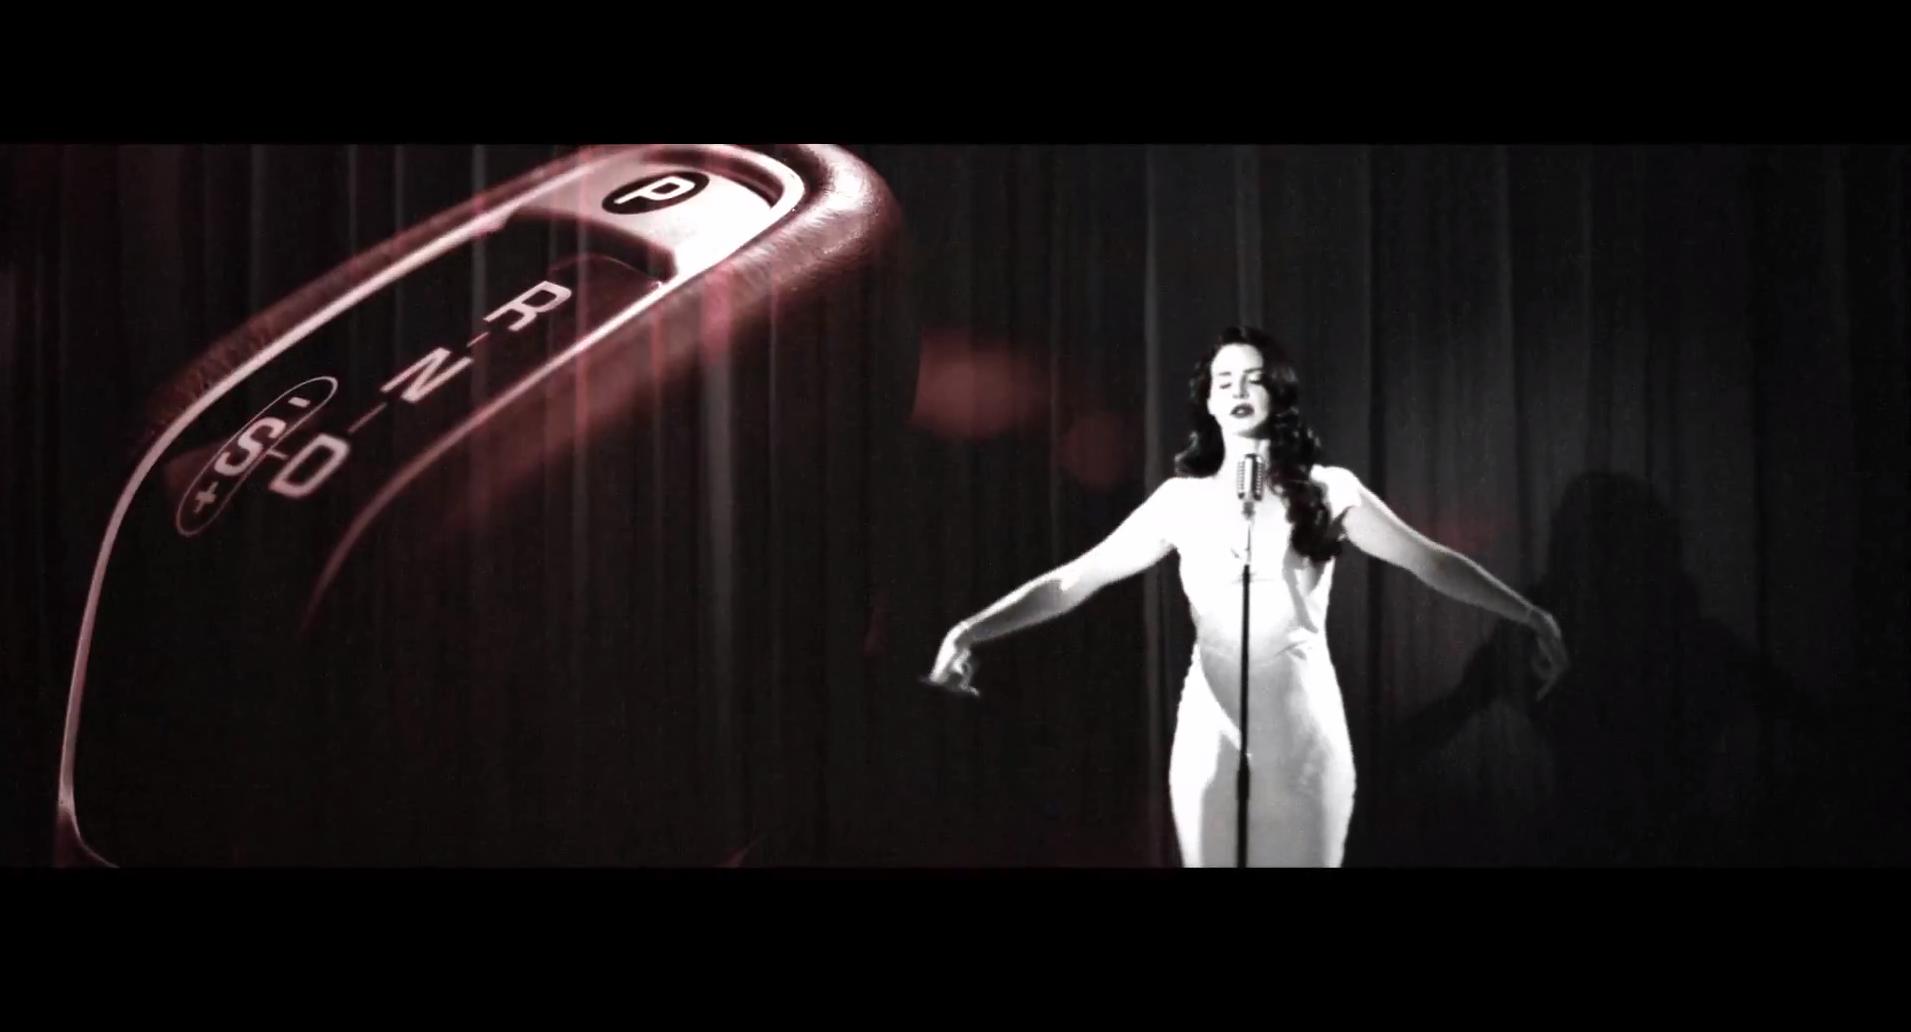 Lana Del Rey S Burning Desire Video Features F Type Jag